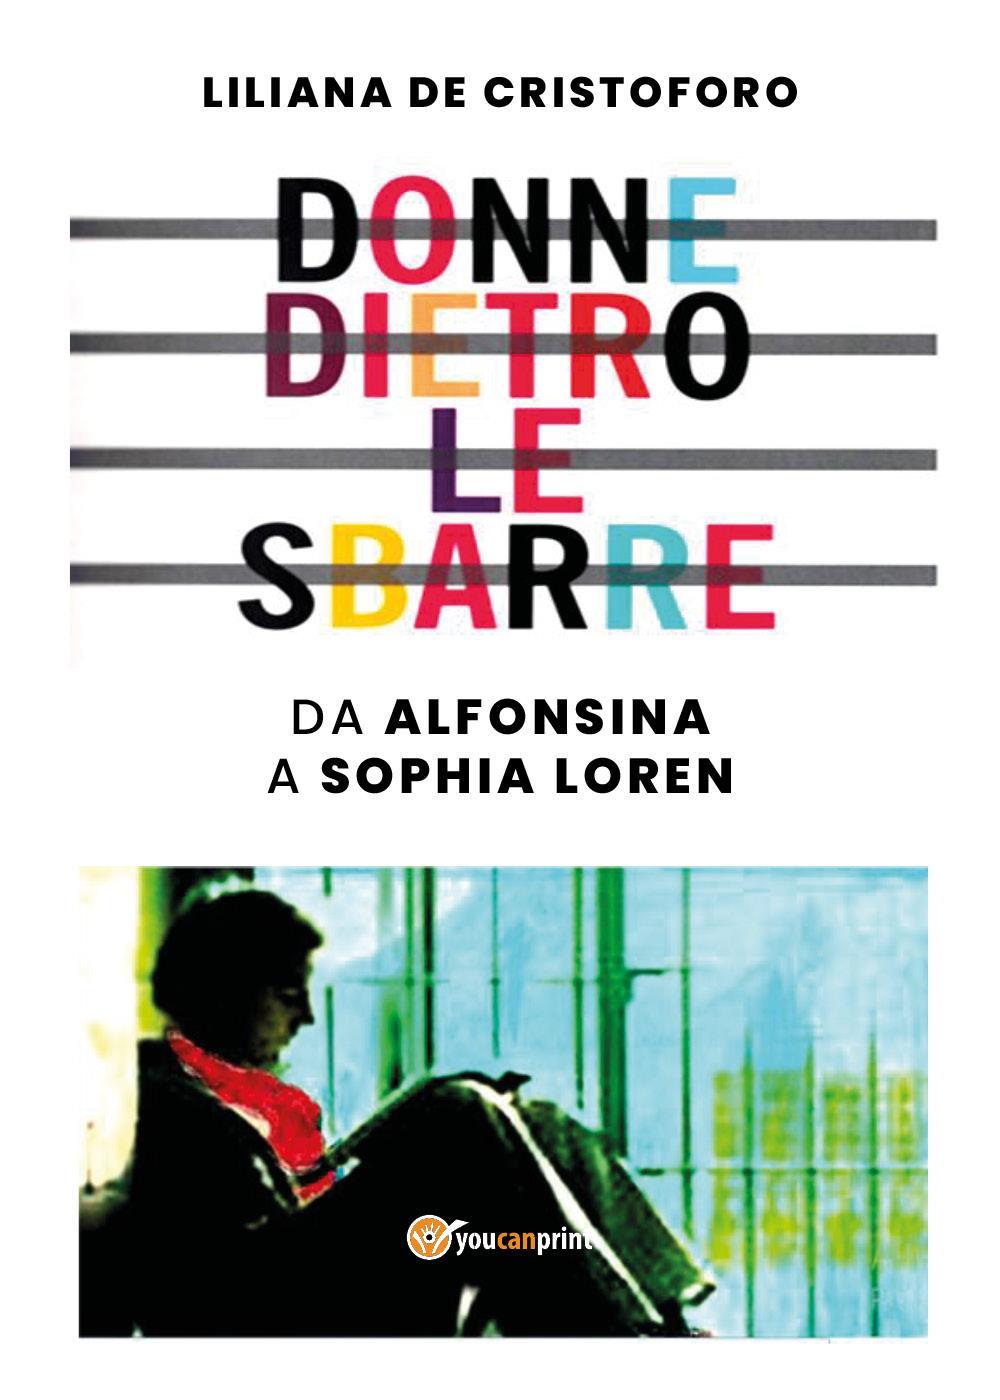 Donne dietro le sbarre. Da Alfonsina a Sophia Loren